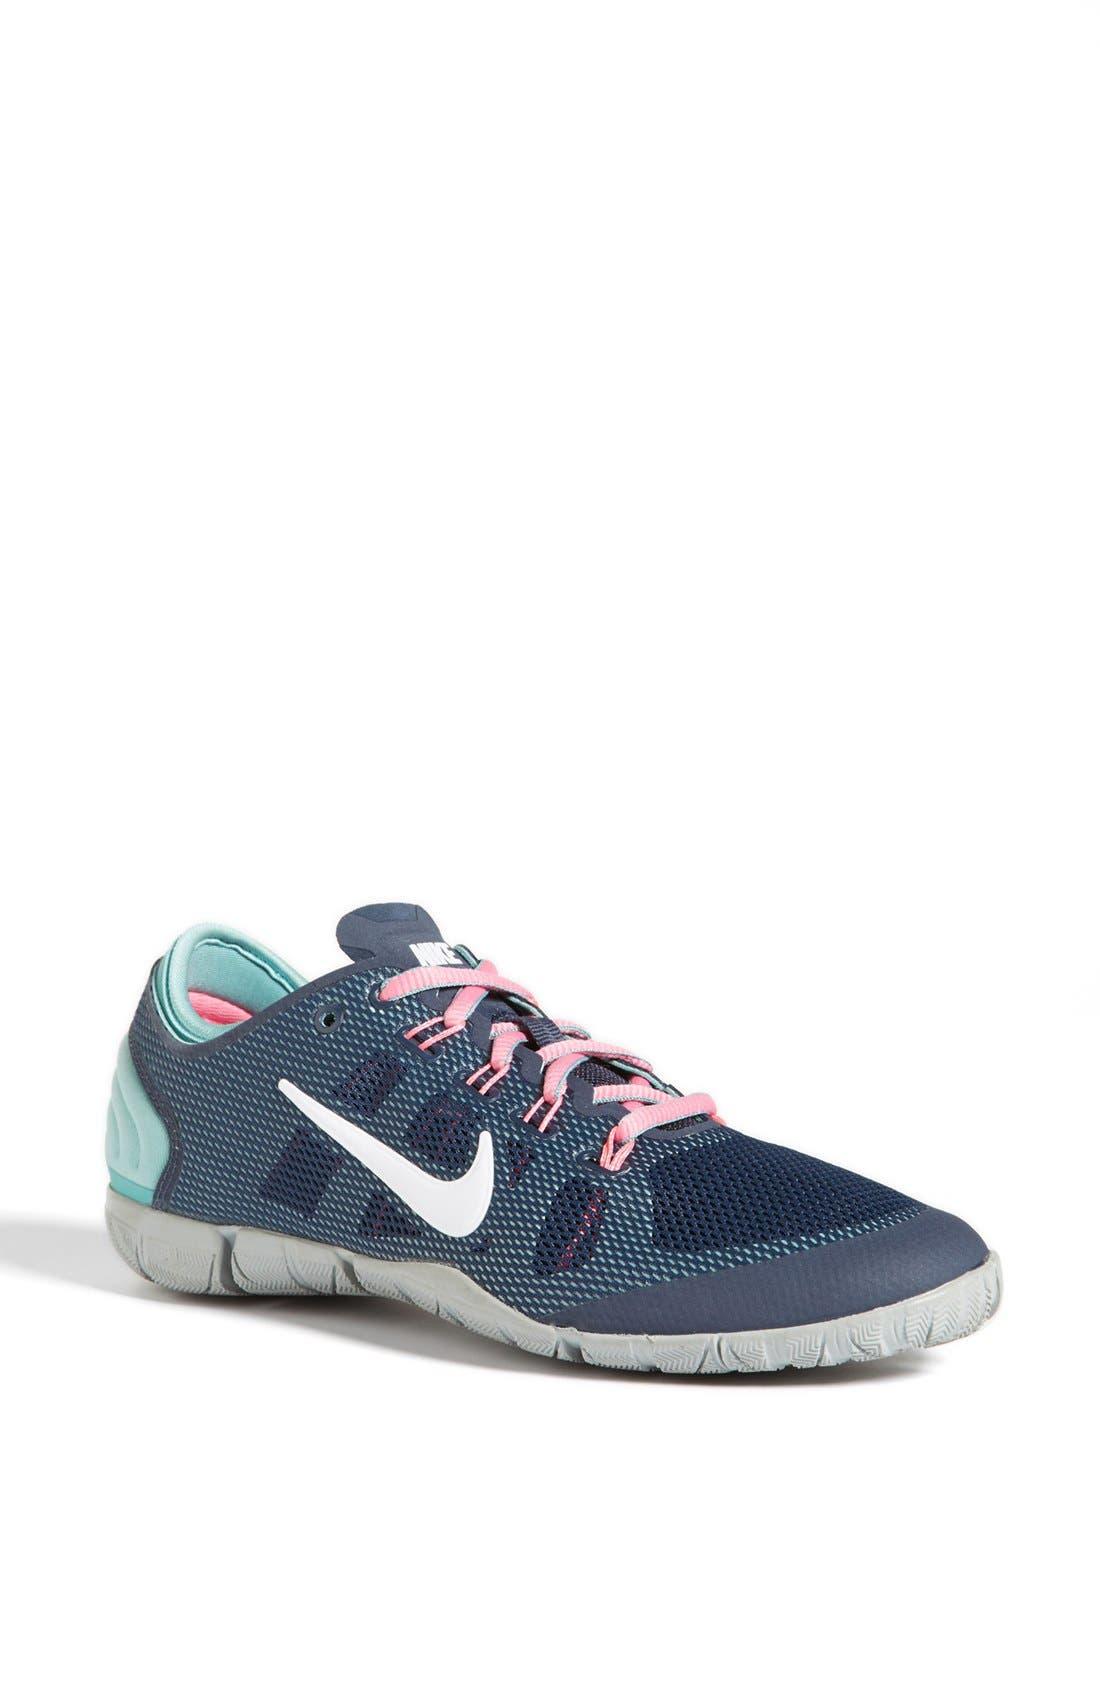 Alternate Image 1 Selected - Nike 'Free Bionic' Training Shoe (Women)